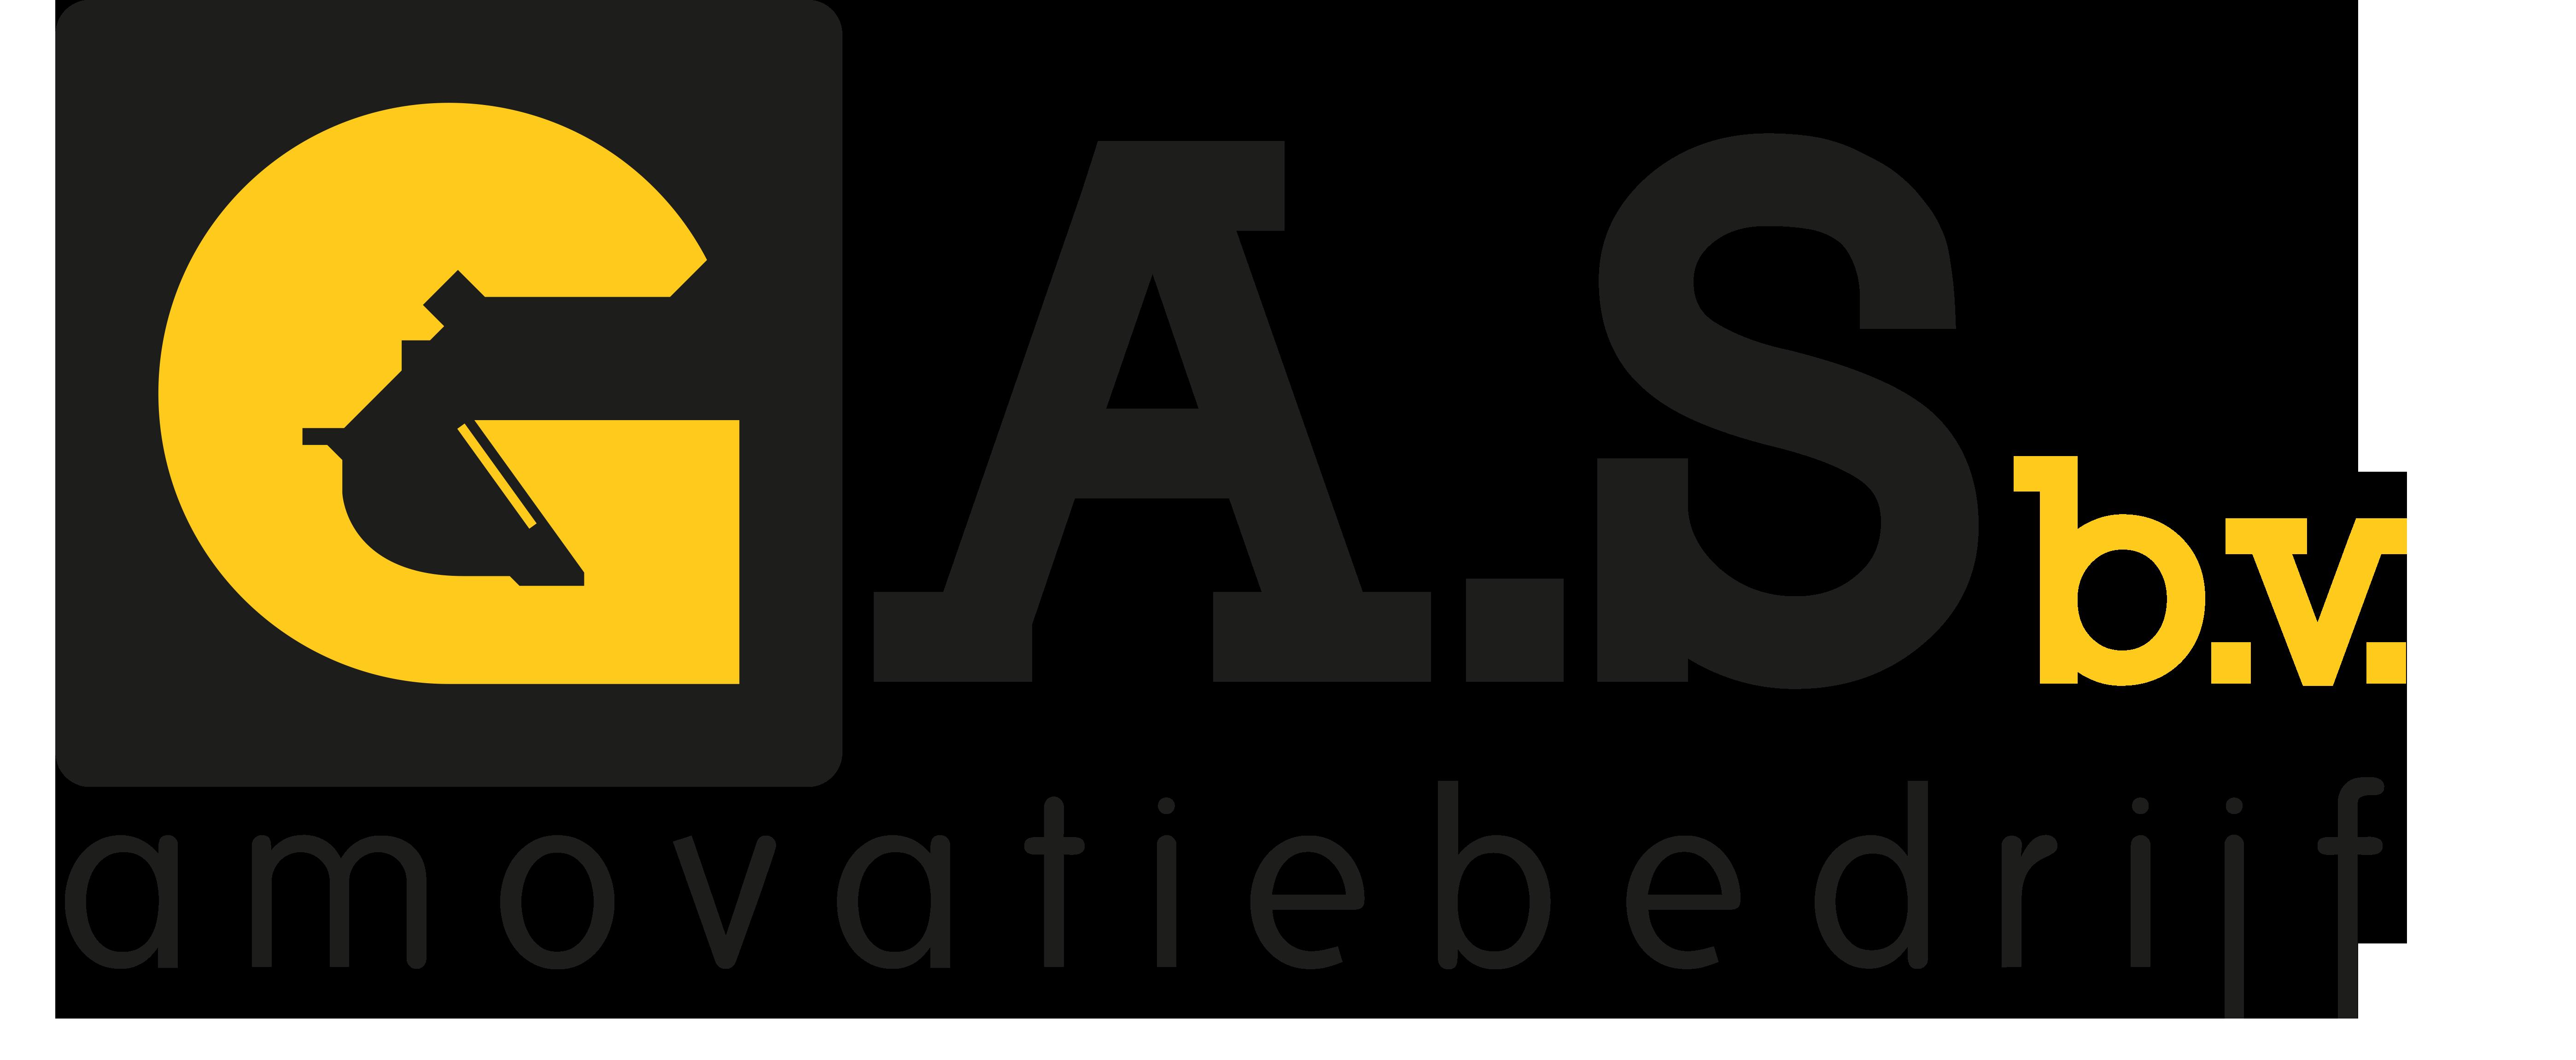 Amovatiebedrijf G.A.S.